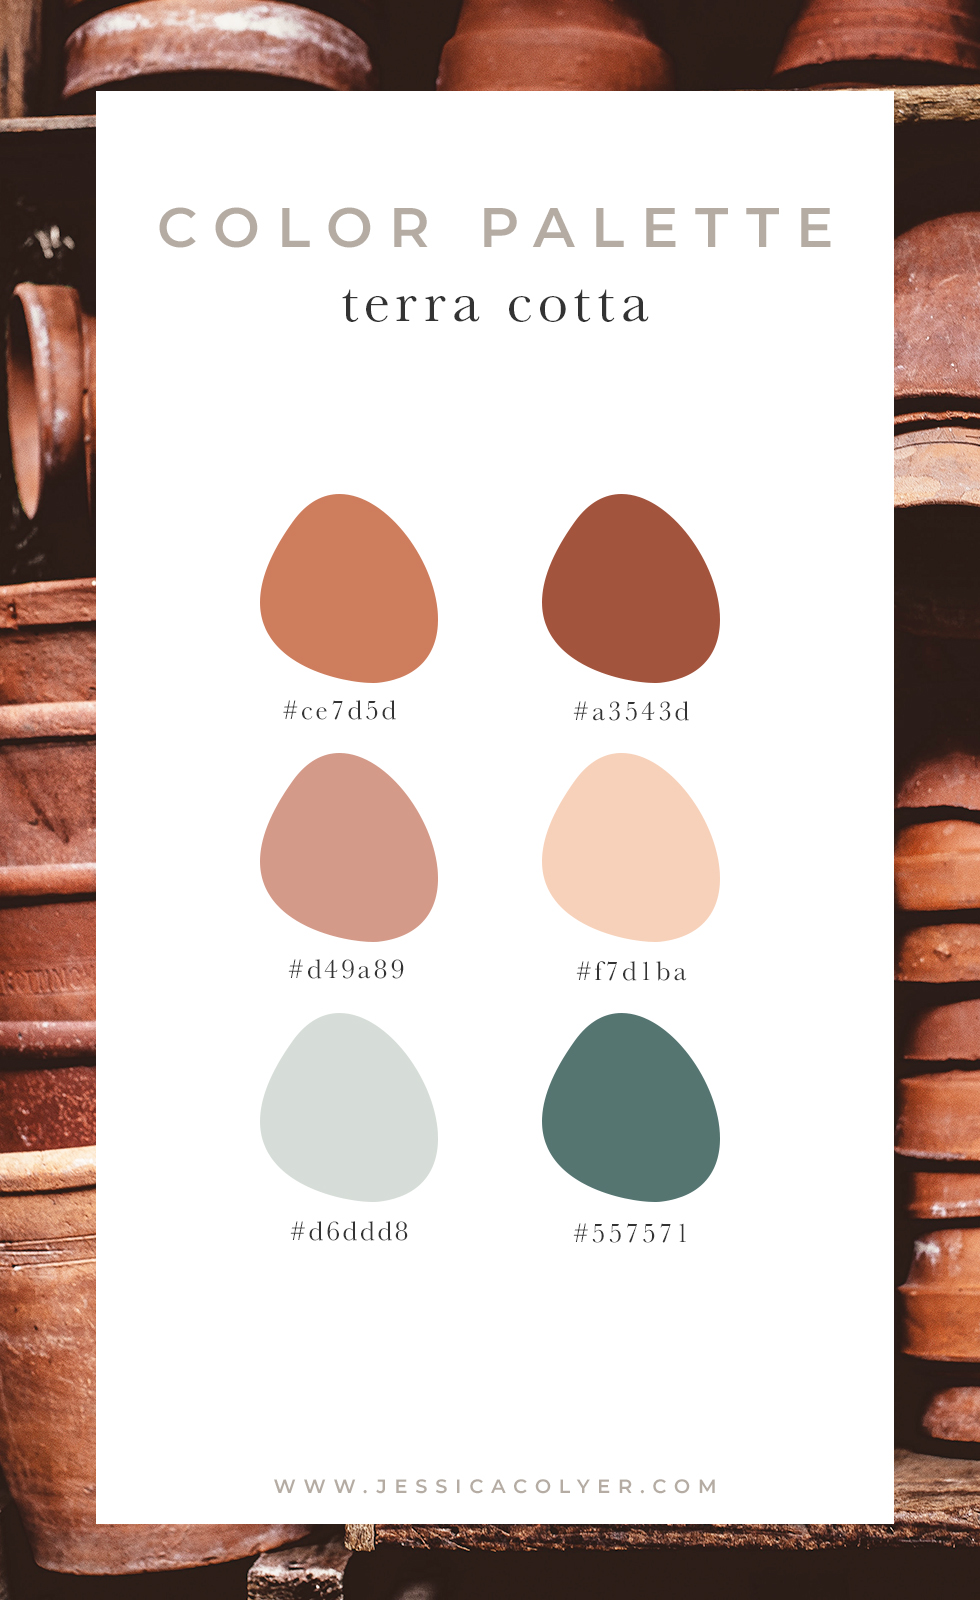 ColorPalette-TerraCotta.jpg